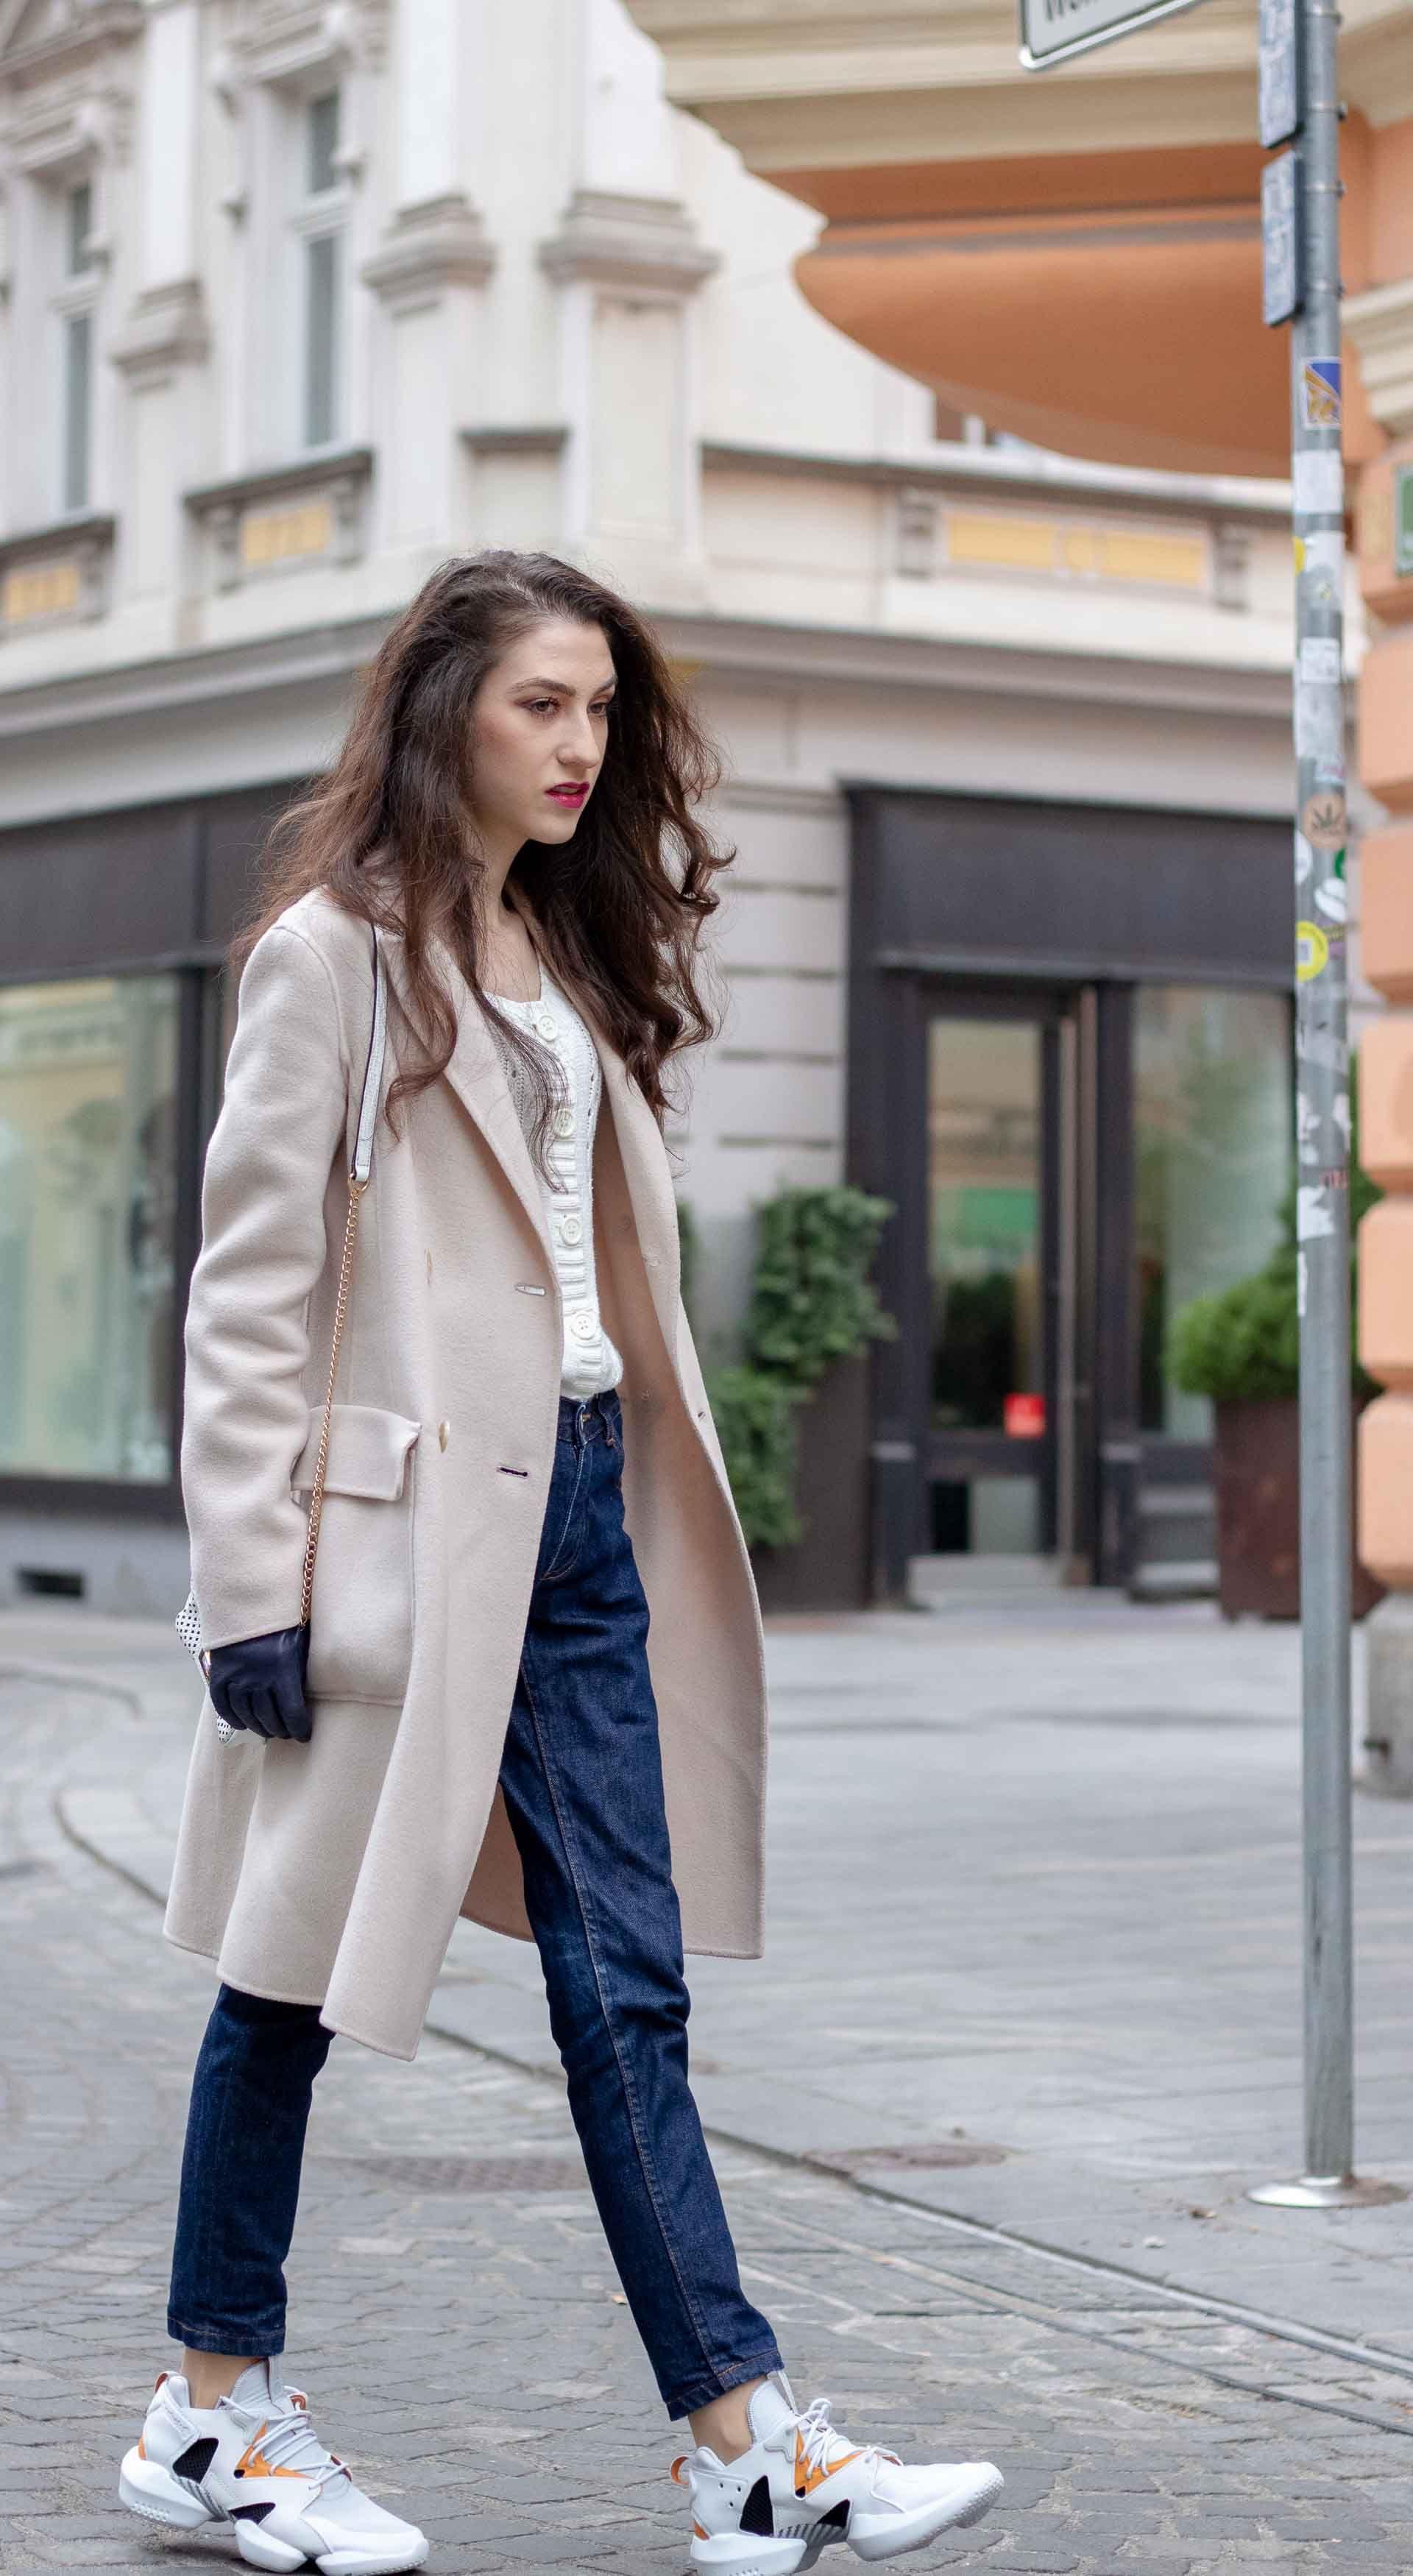 c015c484 Beautiful Slovenian Fashion Blogger Veronika Lipar of Brunette from Wall  dressed in white Mango cardigan tucked into A.P.C. dark blue denim jeans,  Weekend ...